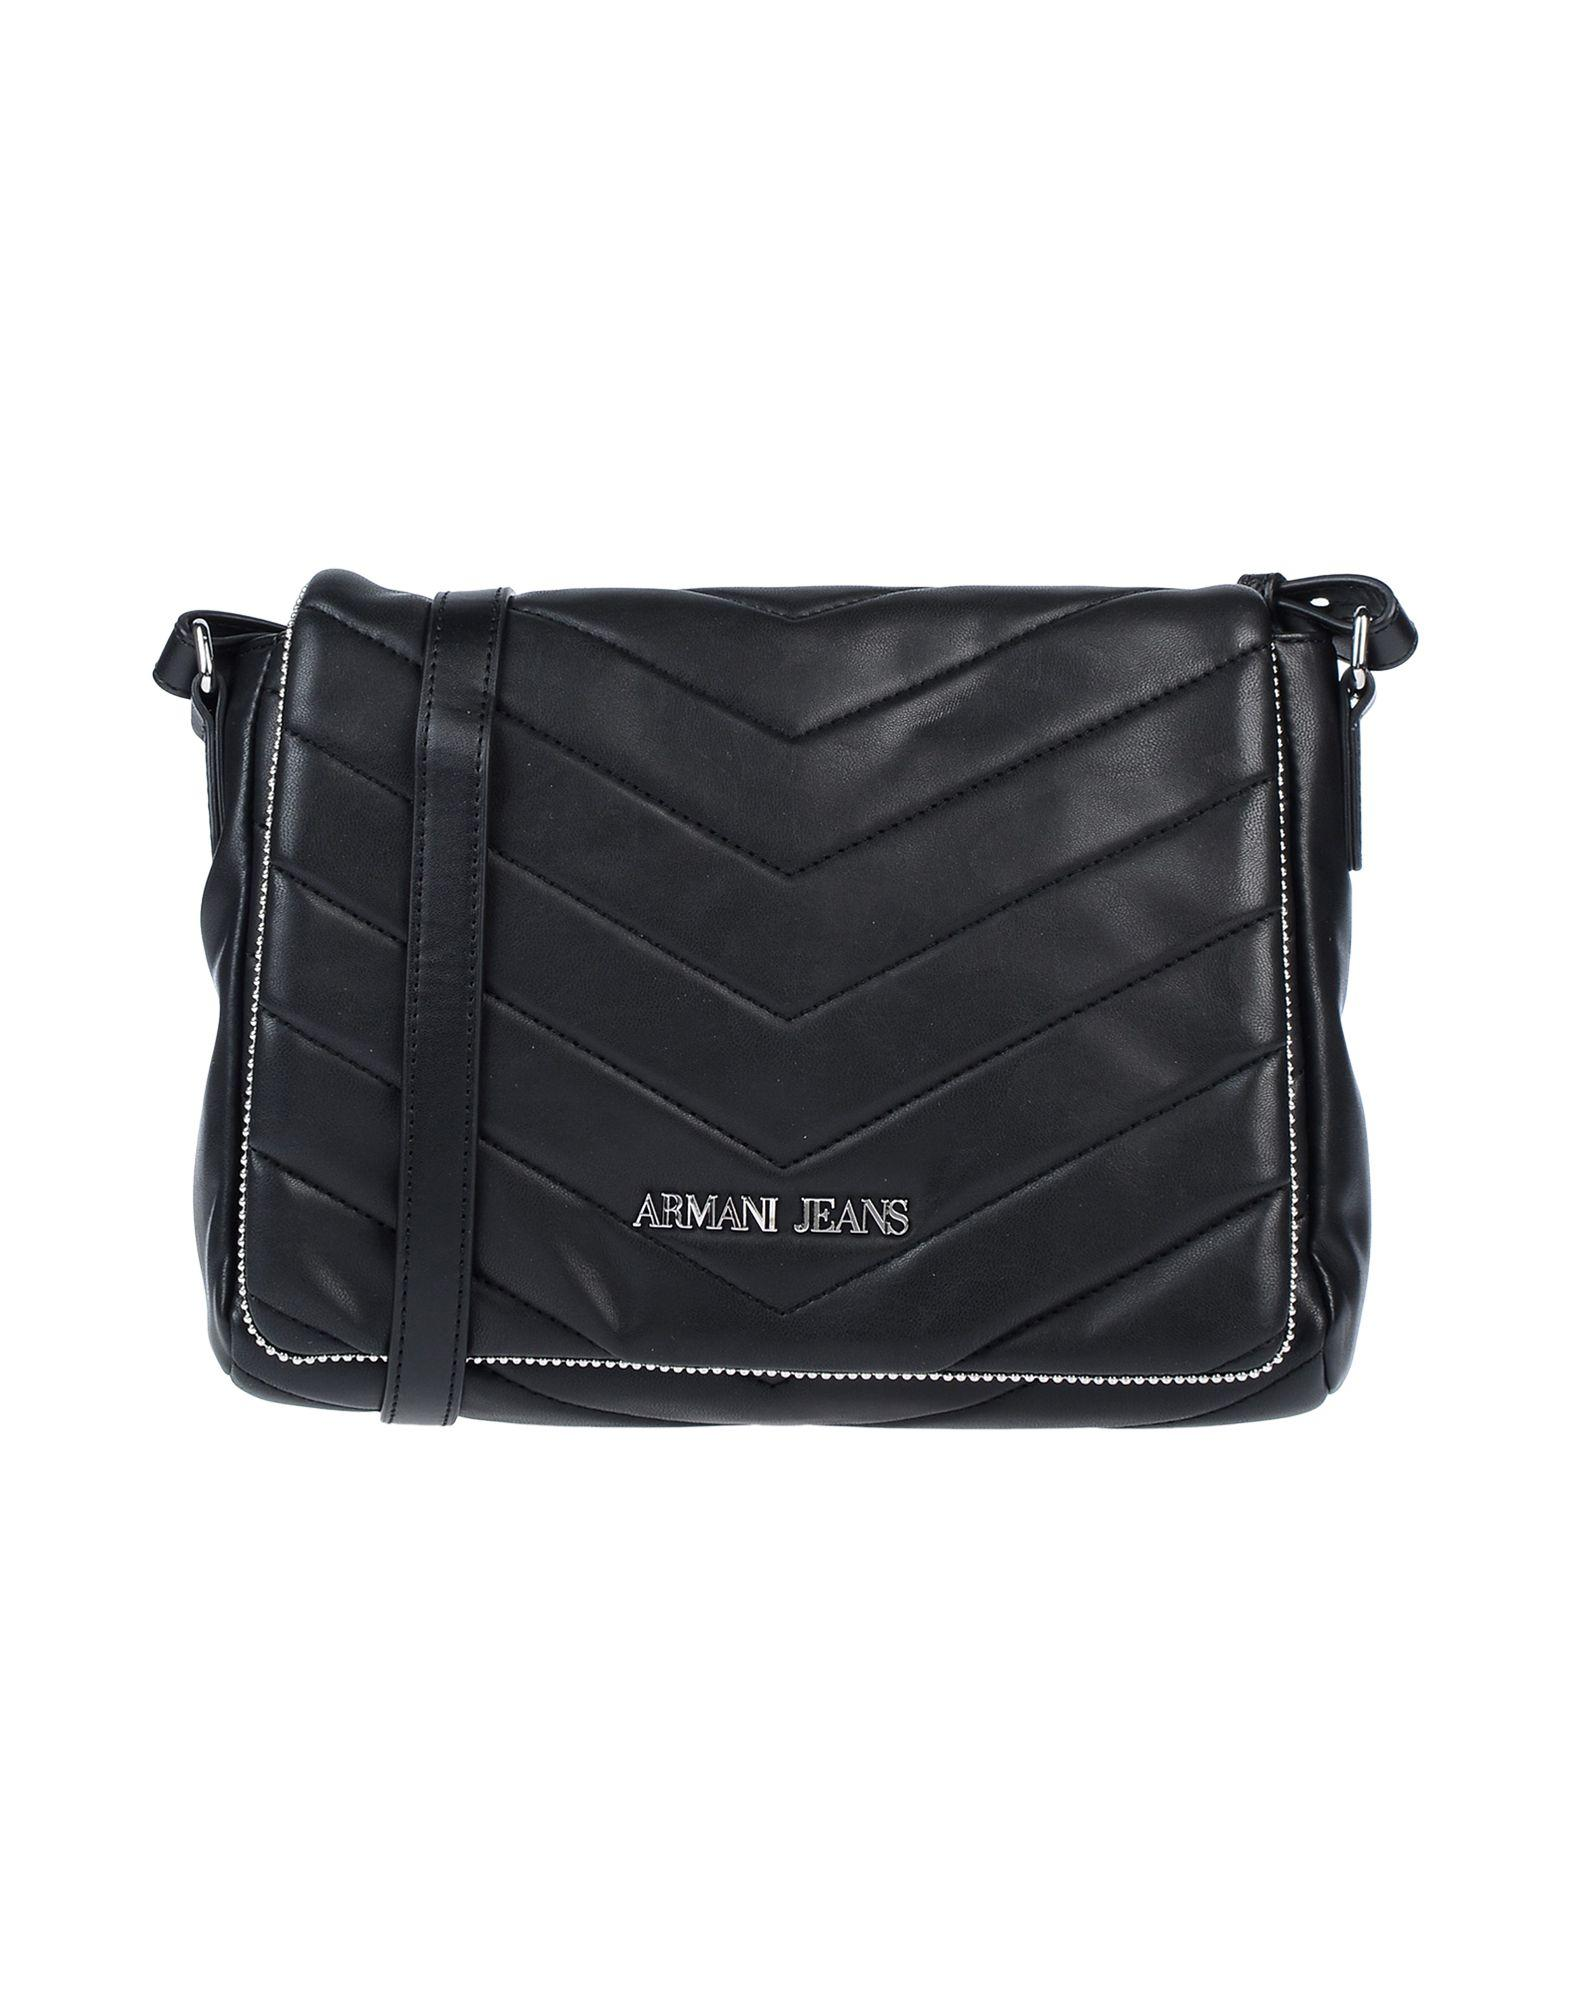 607f9777bd Armani Jeans - Black Cross-body Bag - Lyst. View fullscreen